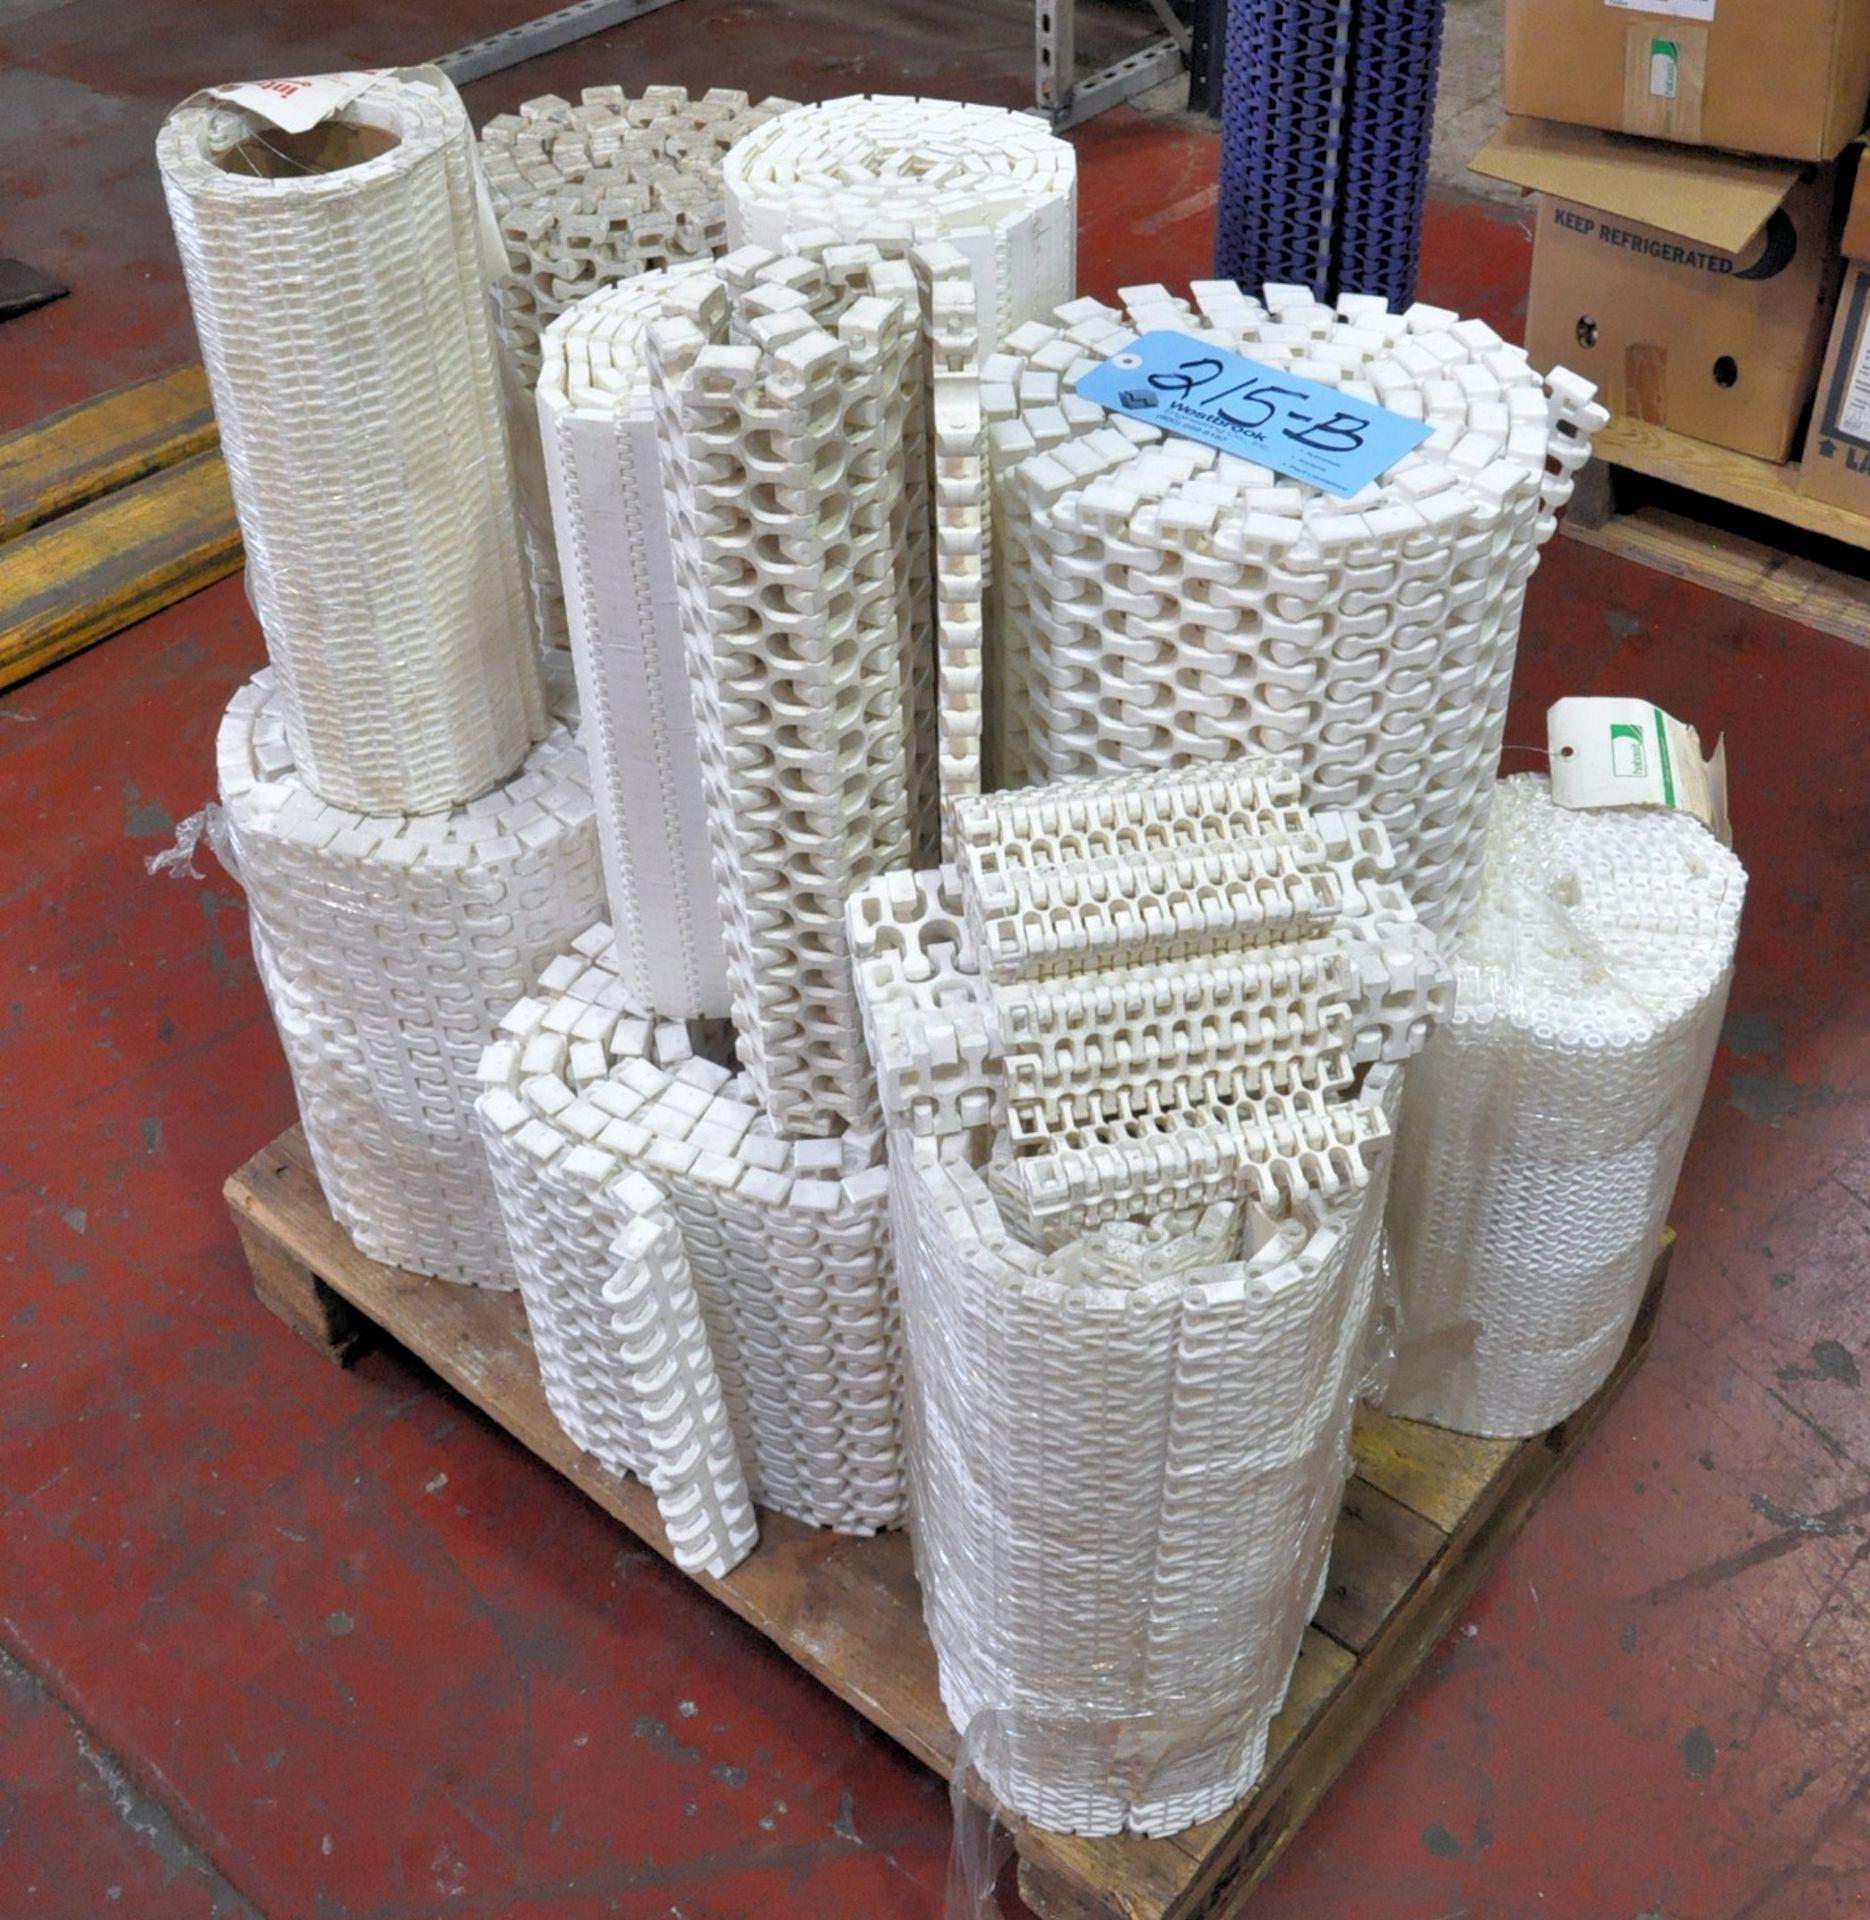 Lot 215B - Lot-PVC Mesh Conveyor Belt Materials on (1) Pallet